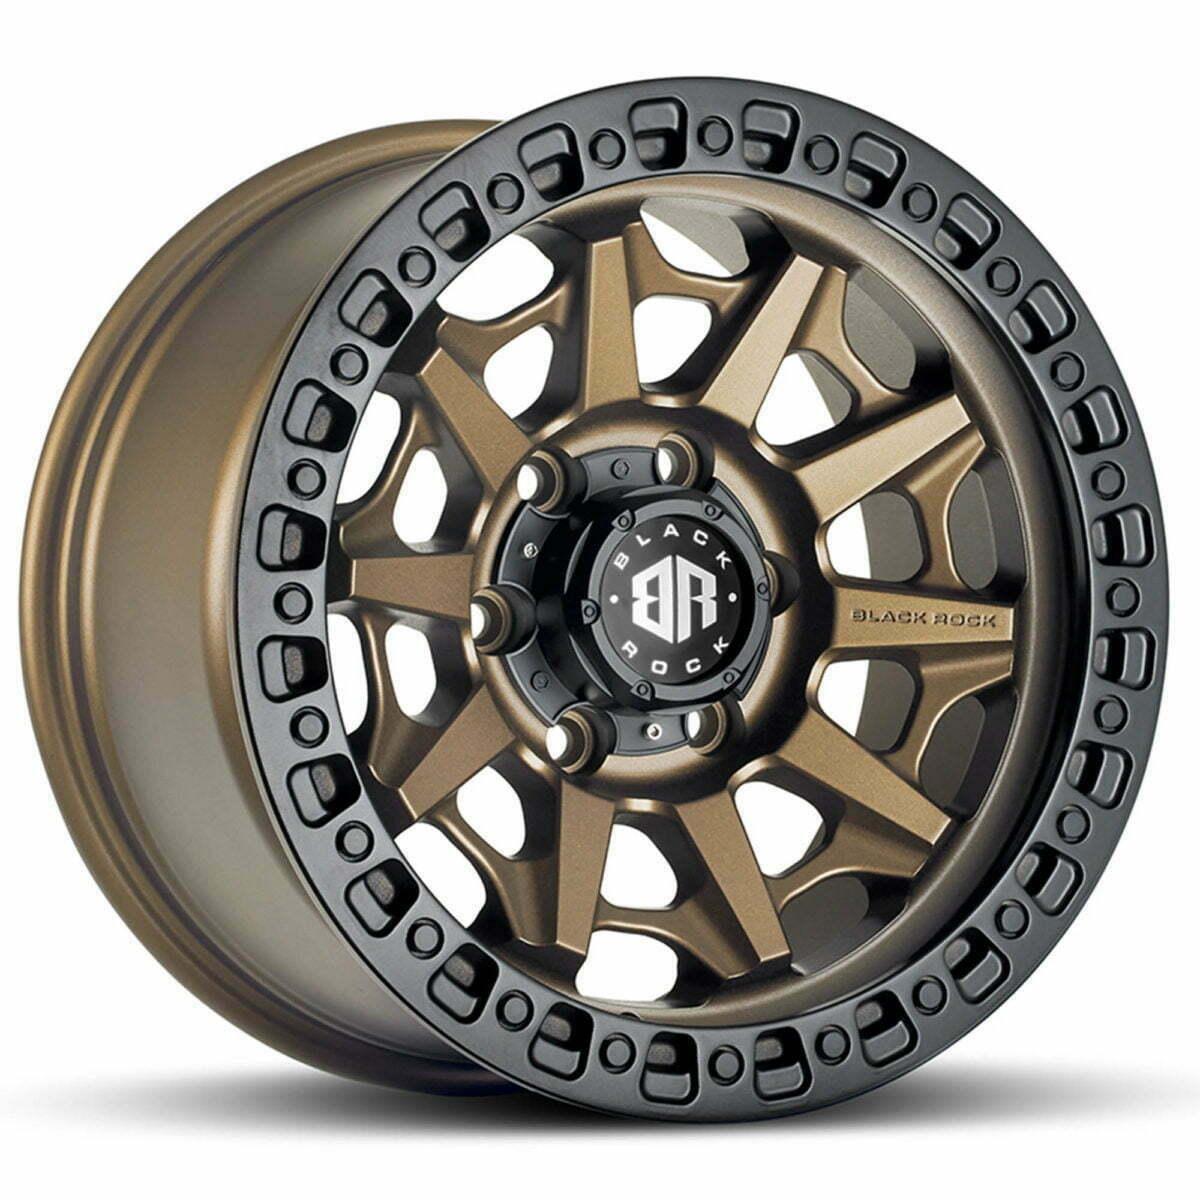 Black Rock Cage Dark Bronze With Black Ring Wheels Off-Road Rims